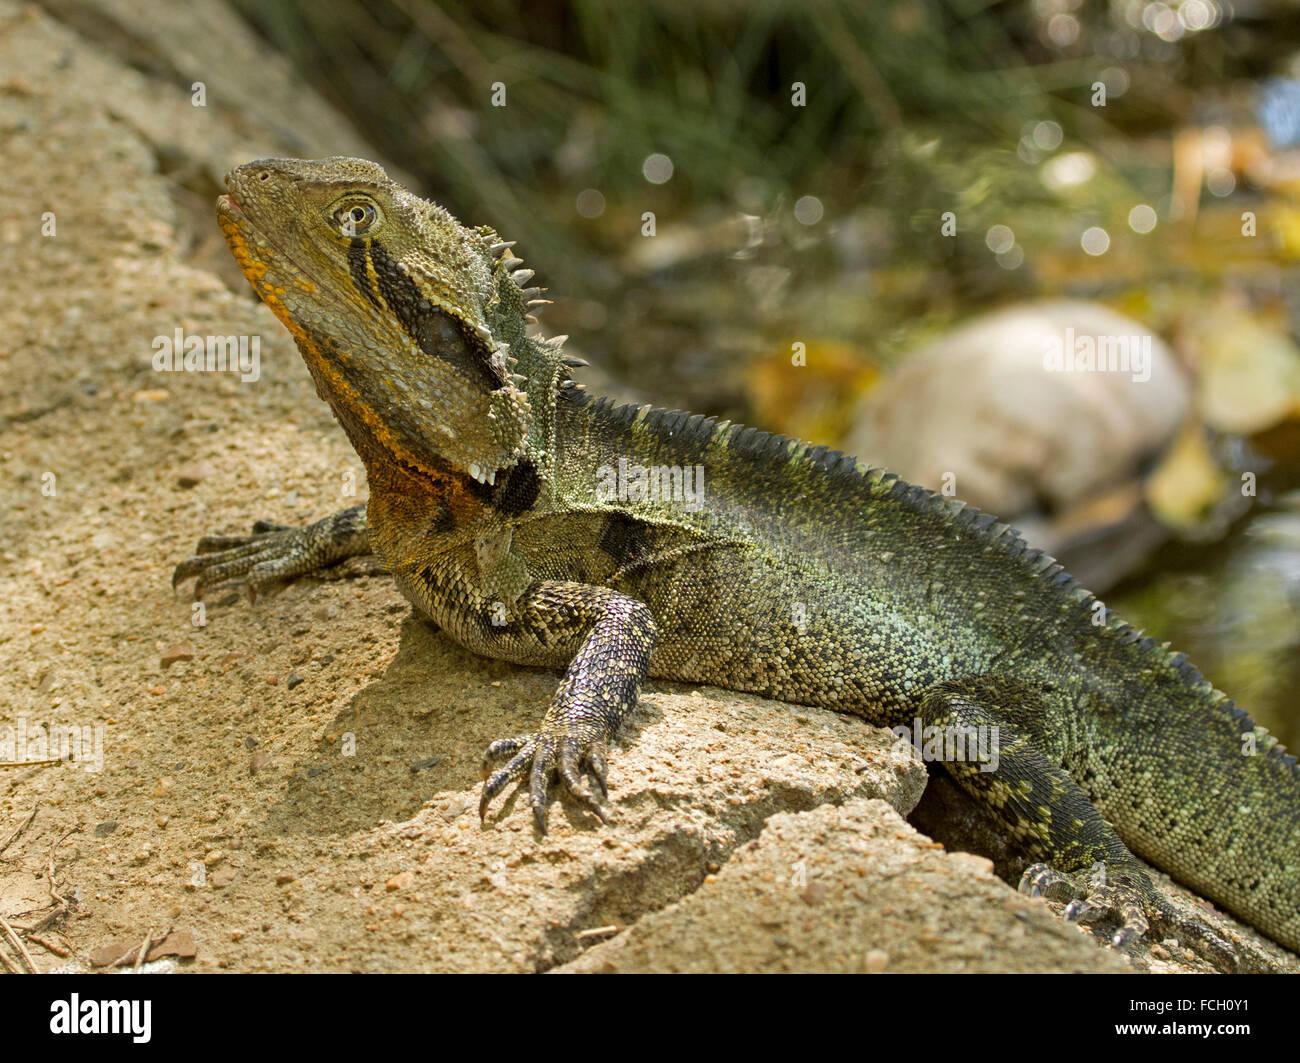 Australian Water Dragon Lizard: Australian Eastern Water Dragon Lizard, Physignathus